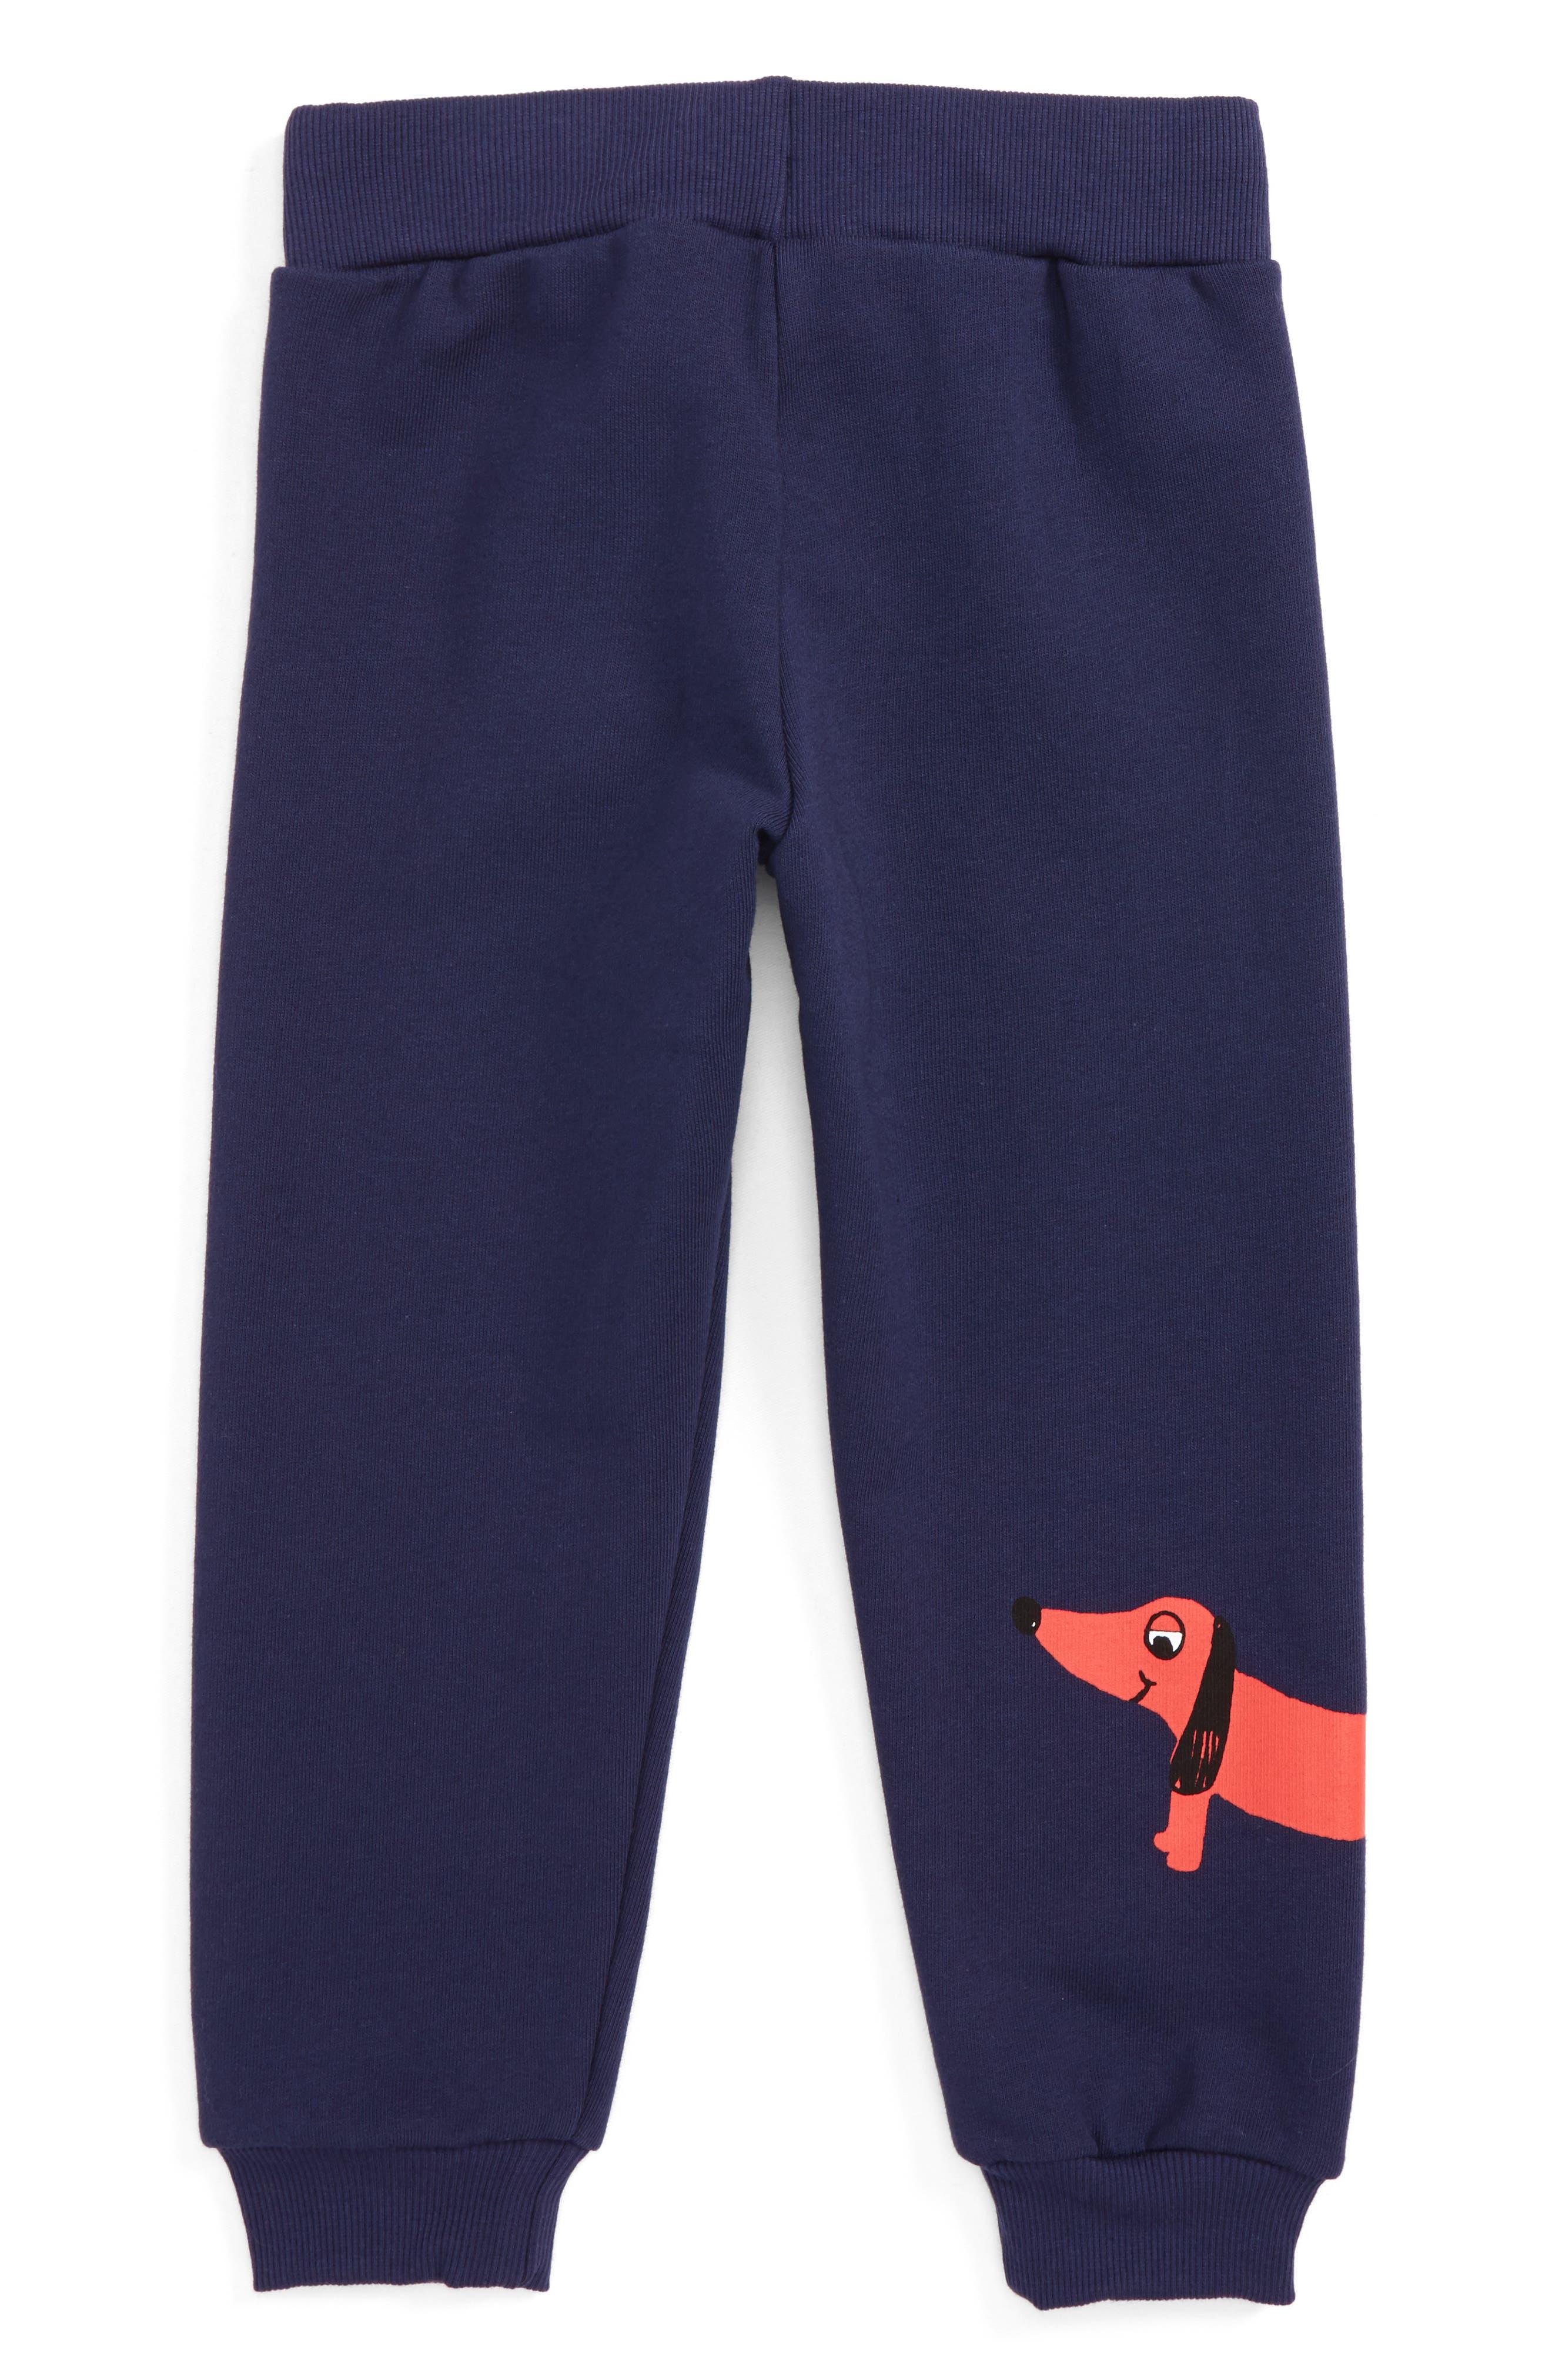 Dog Sweatpants,                             Alternate thumbnail 2, color,                             Navy